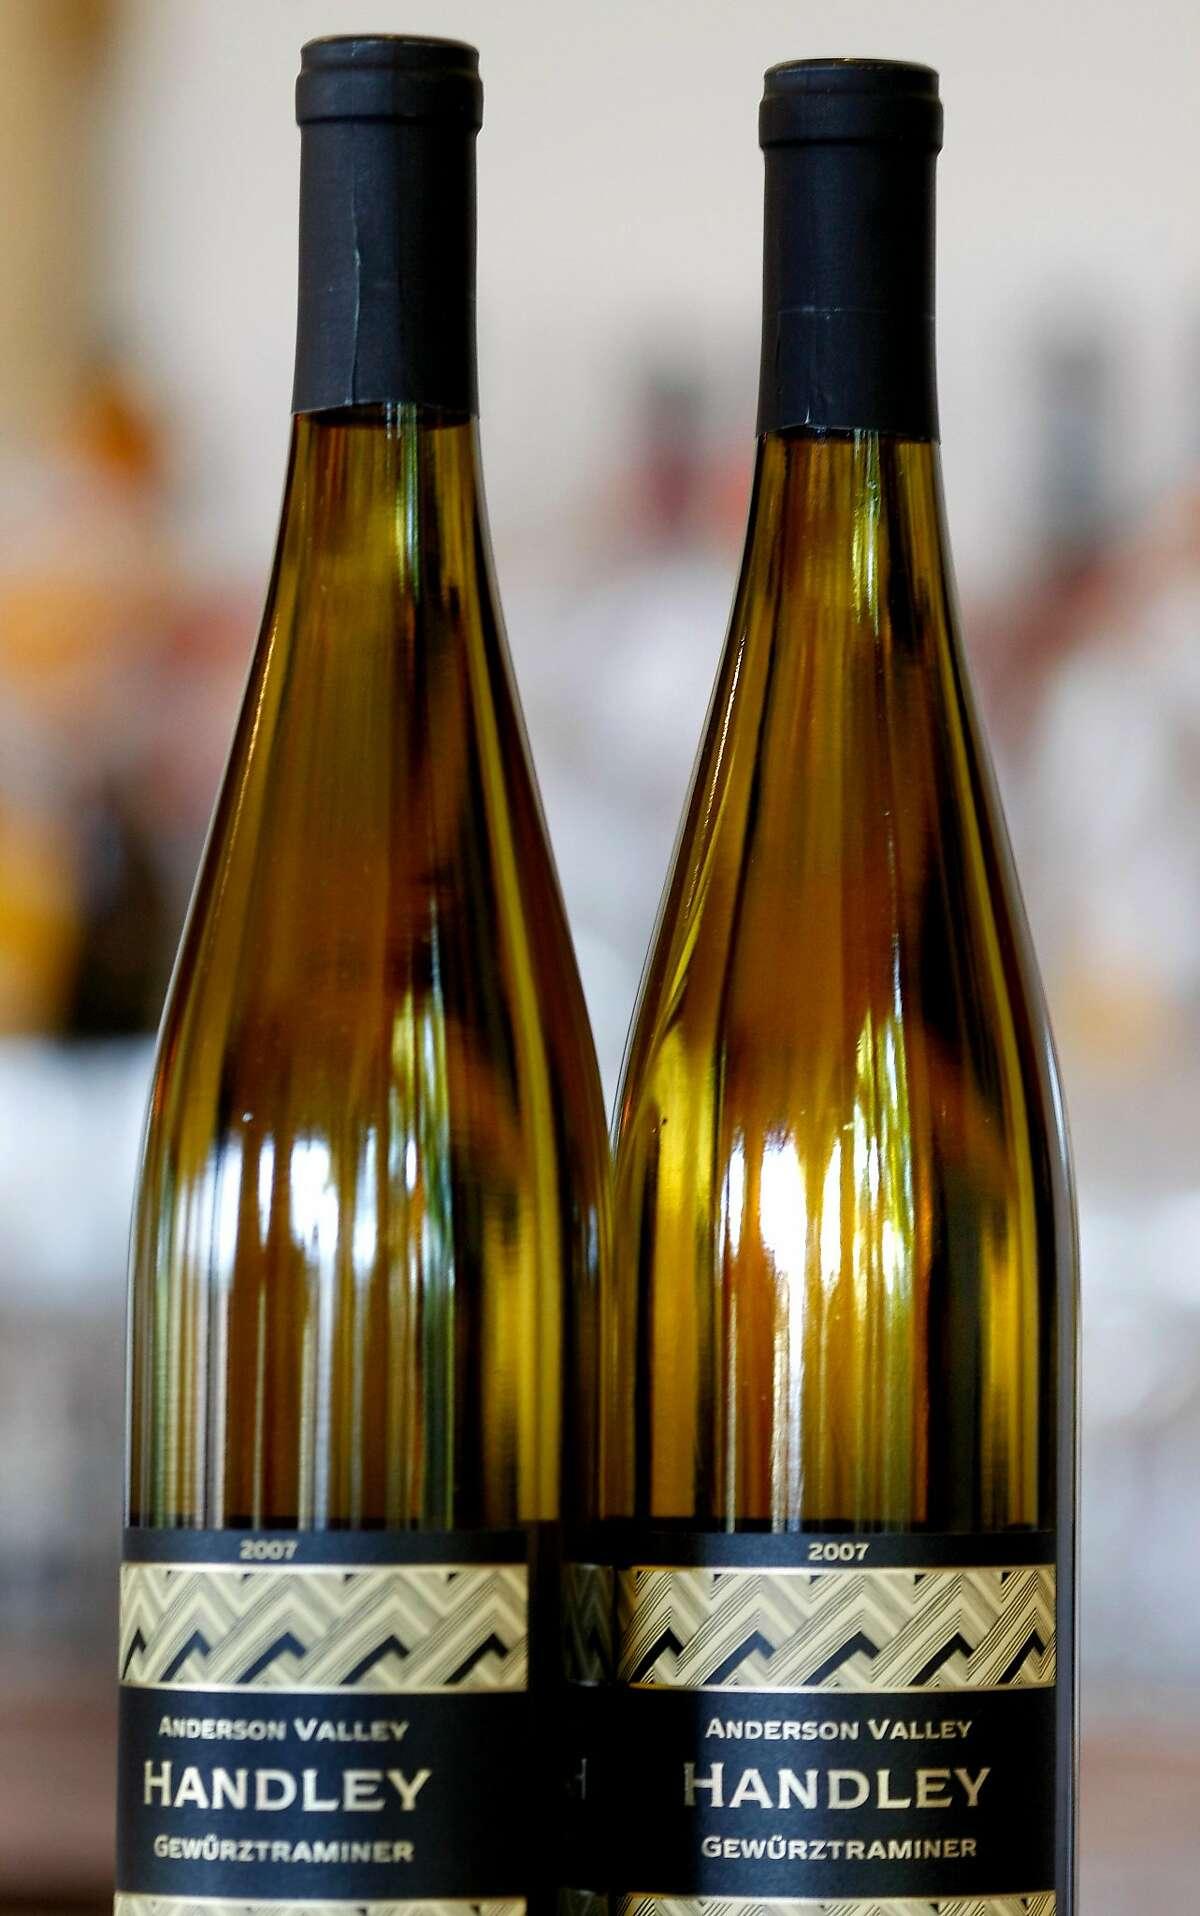 The distinctive Gewurztraminer of Handley Cellars is a popular varietal that is very dry. Milla Handley is the winemaker for Hanley Cellars off highway 128 in the Anderson Valley of Mendocino County.